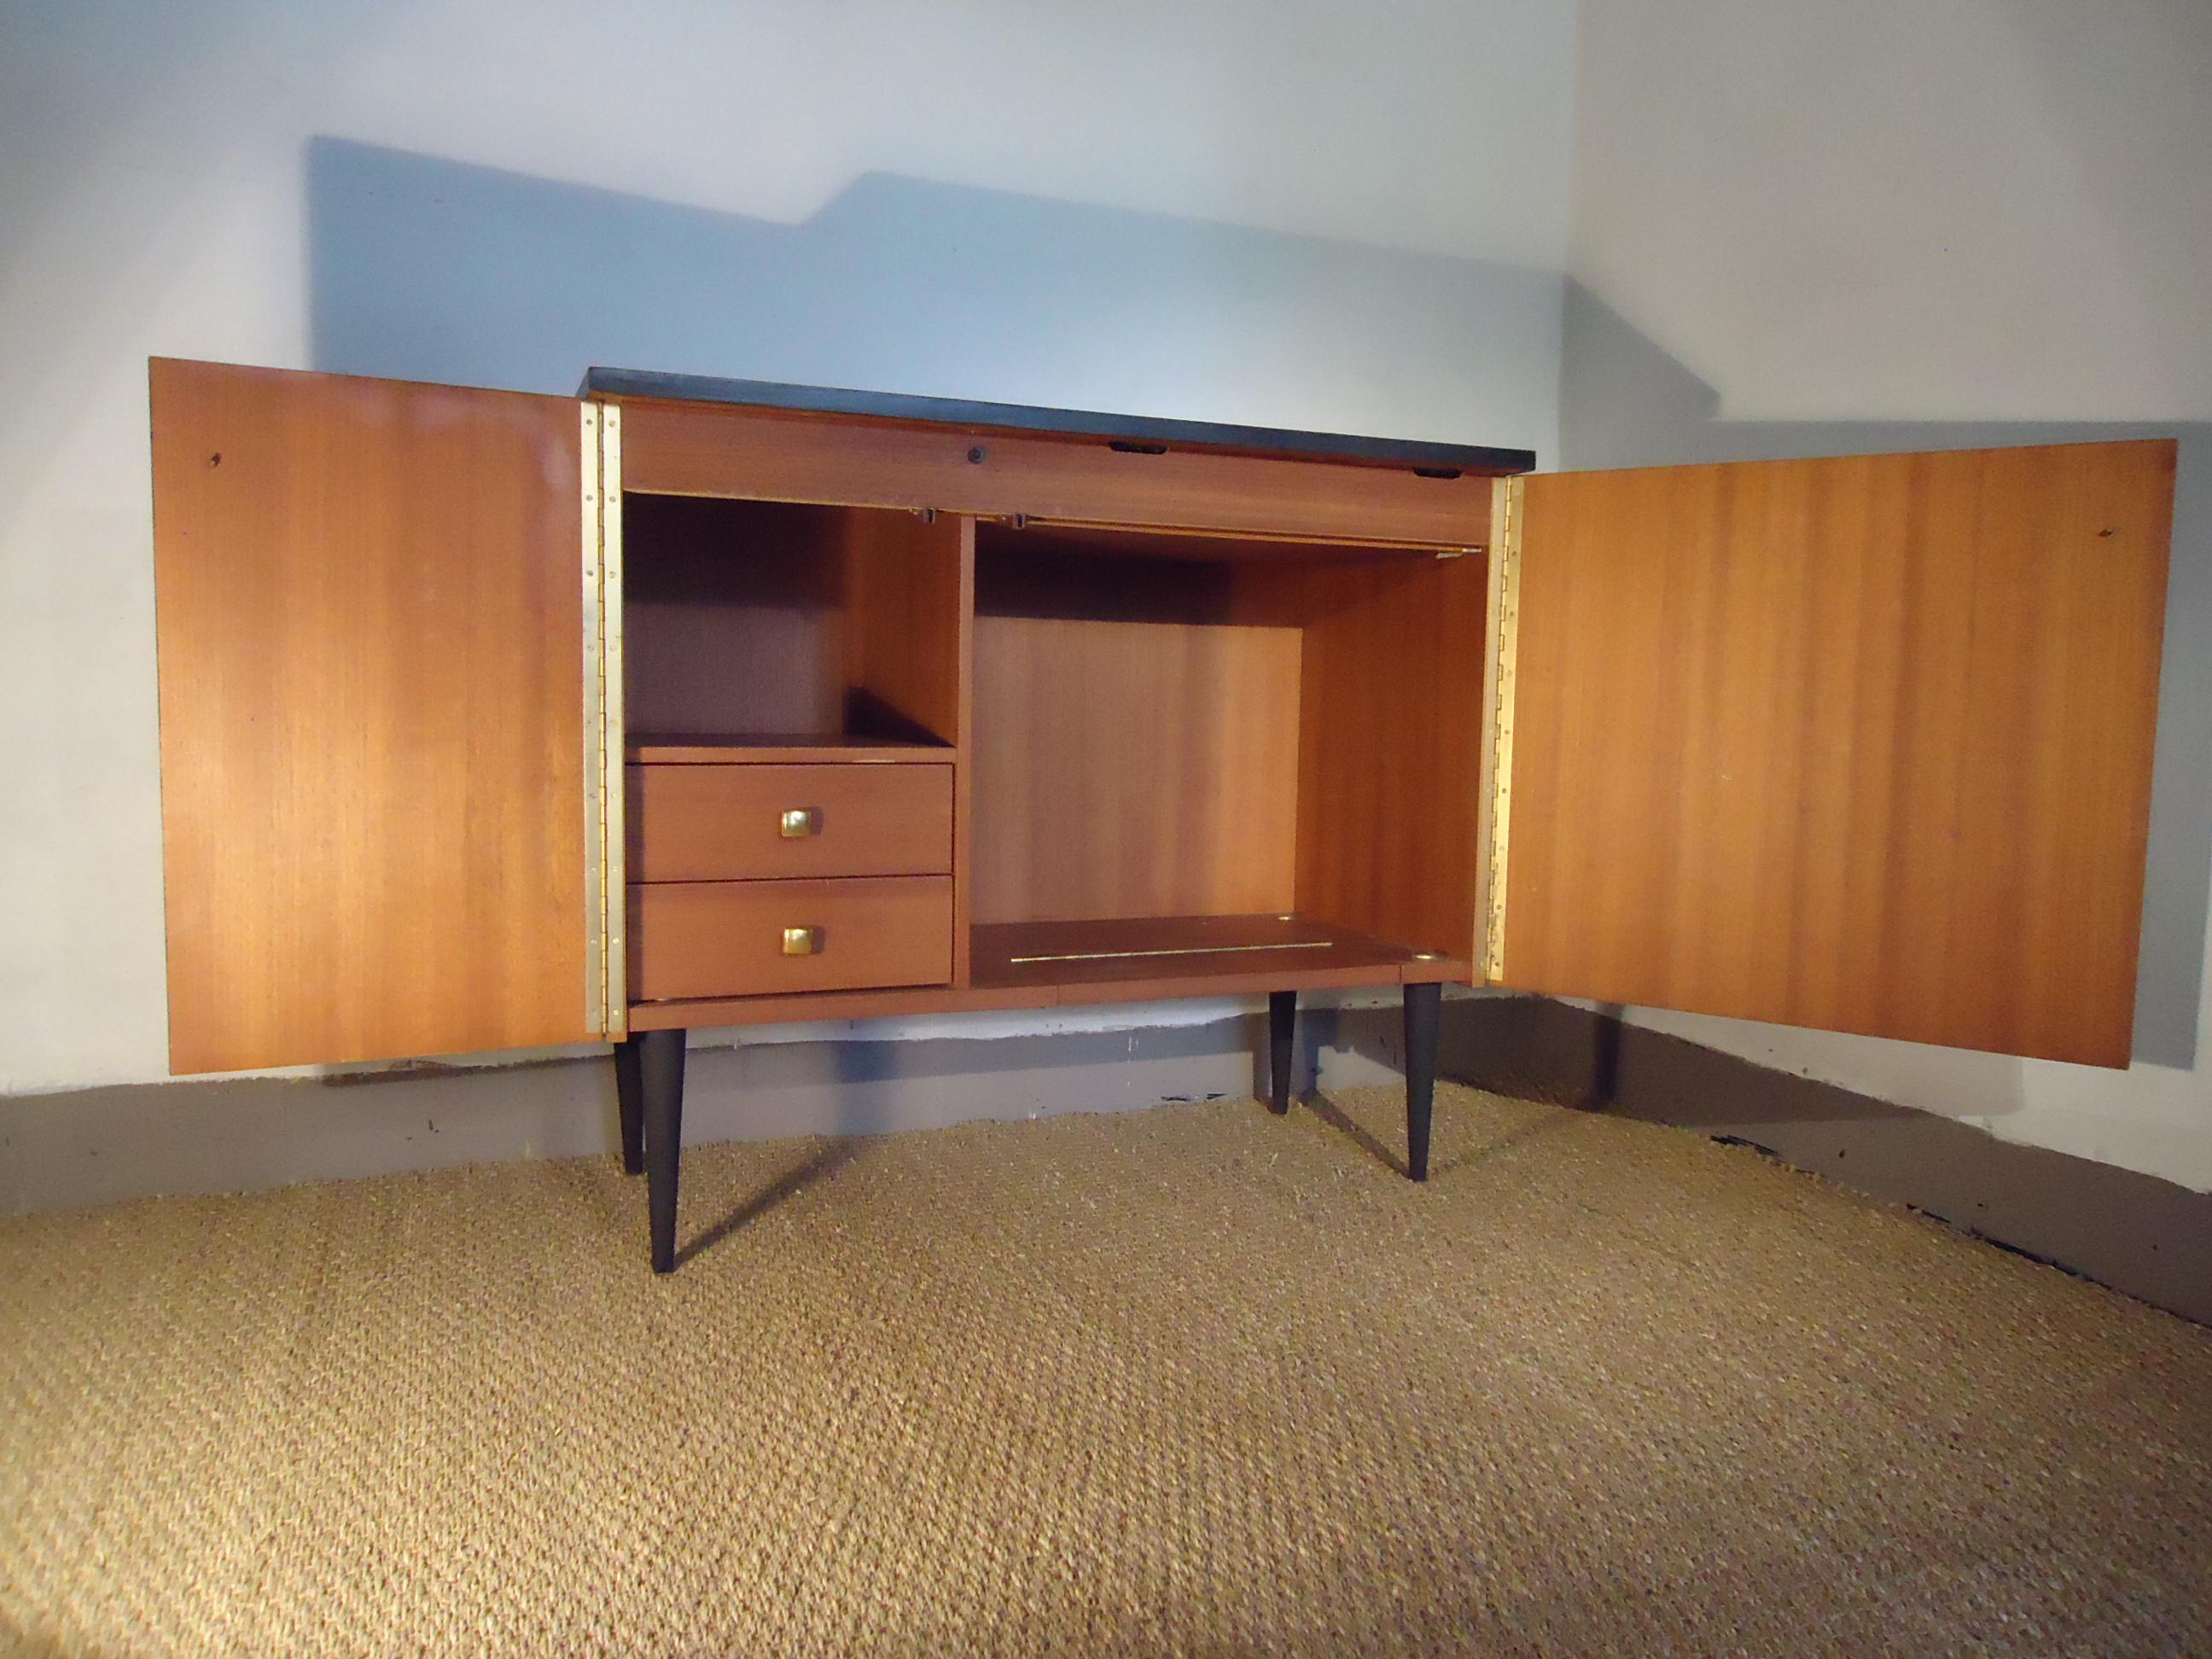 petit meuble scandinave vendu lu bee. Black Bedroom Furniture Sets. Home Design Ideas